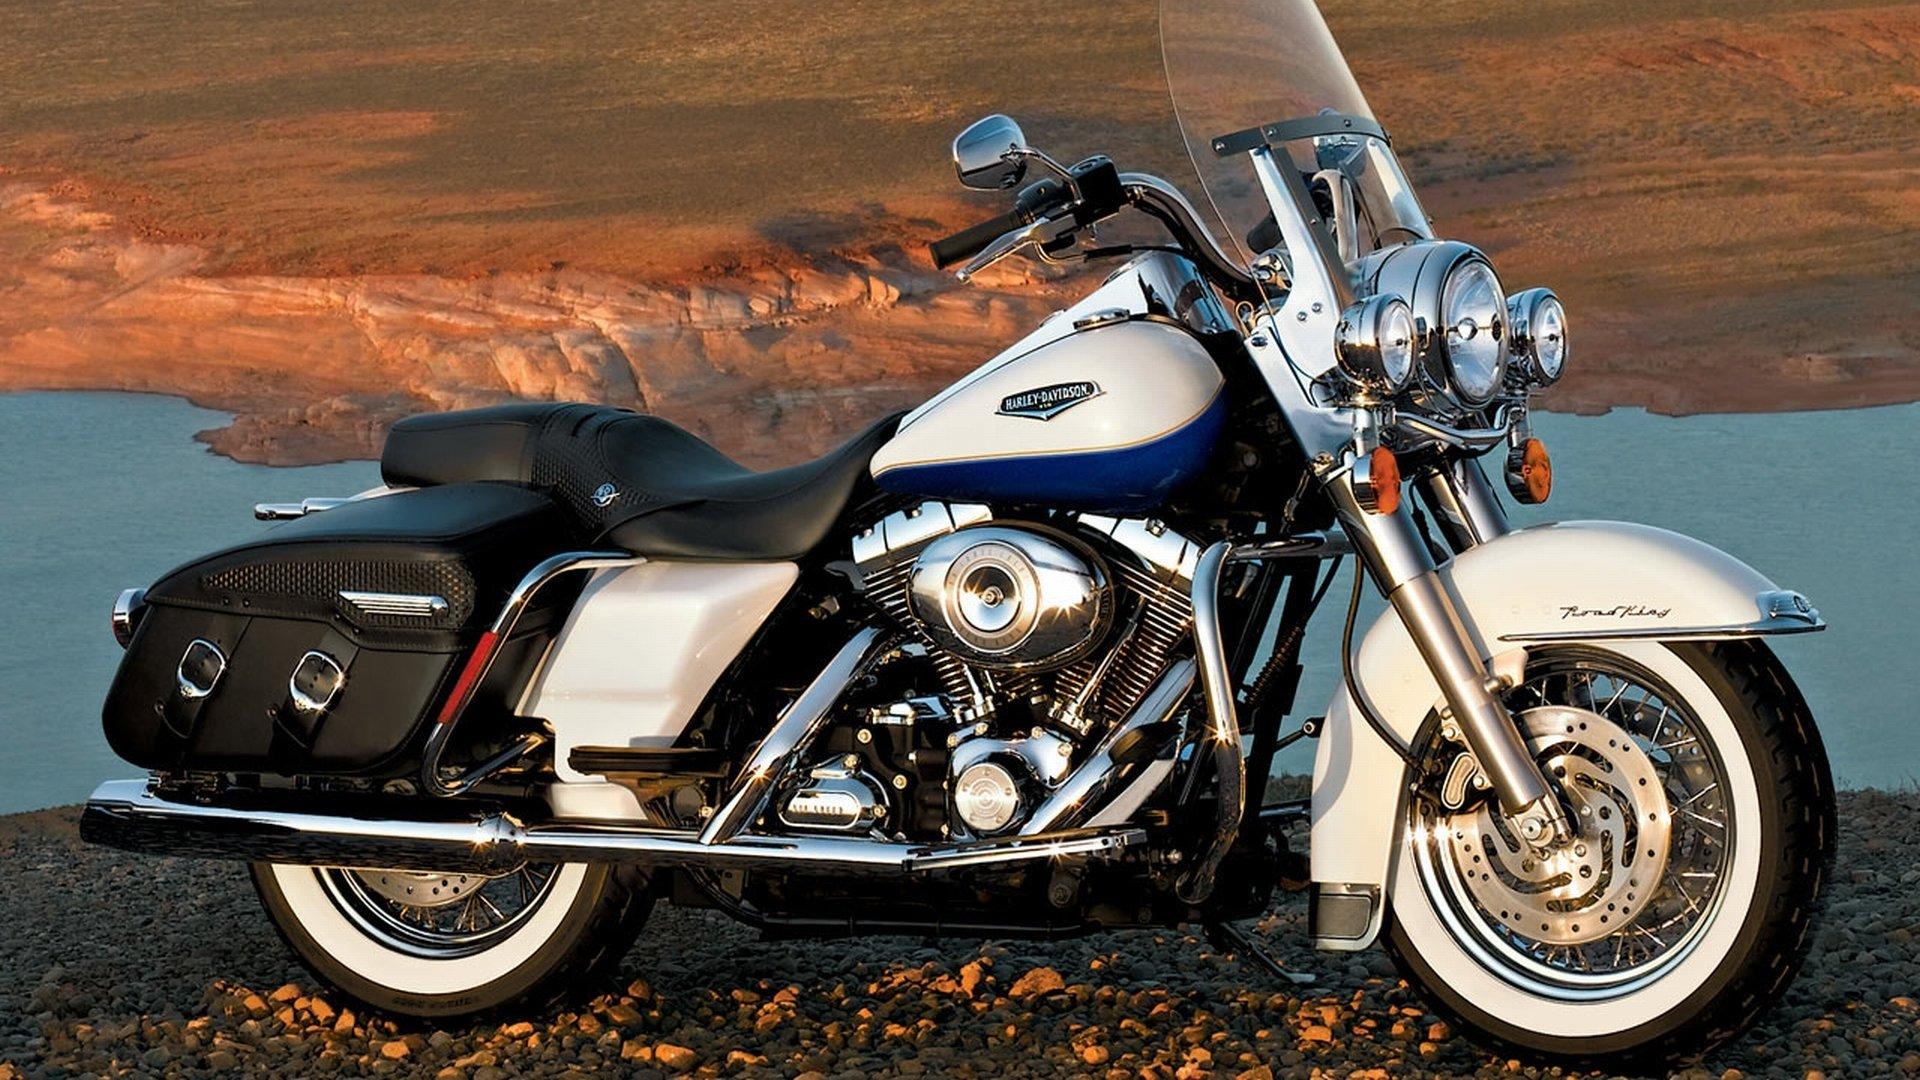 Harley-Davidson Road King HD Wallpaper